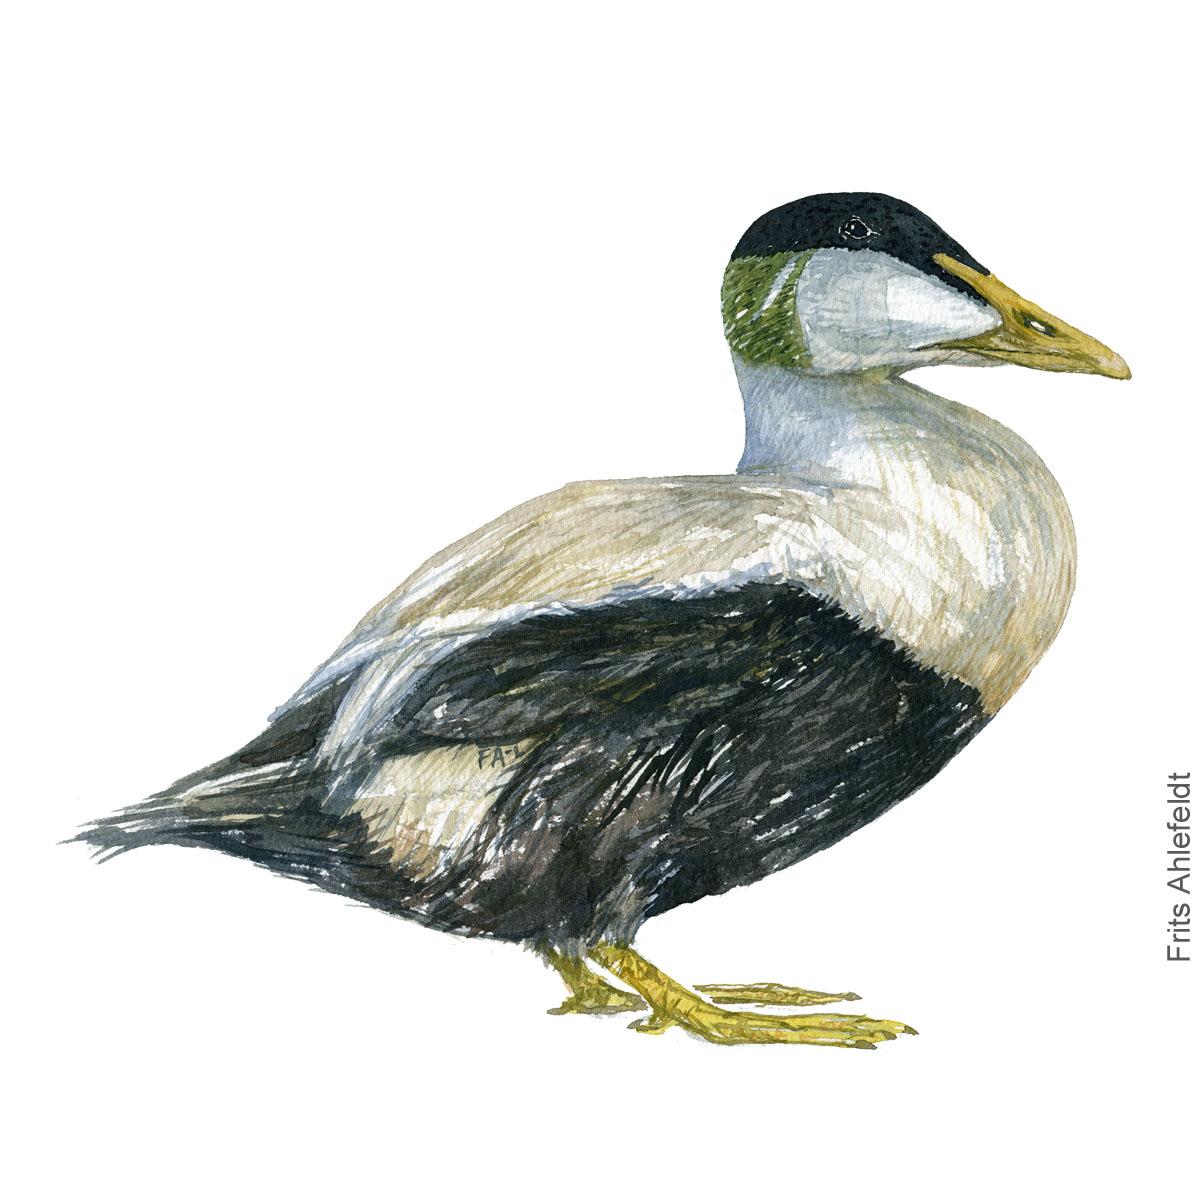 Edderfugl - Eider bird watercolor illustration. Painting by Frits Ahlefeldt. Fugle akvarel